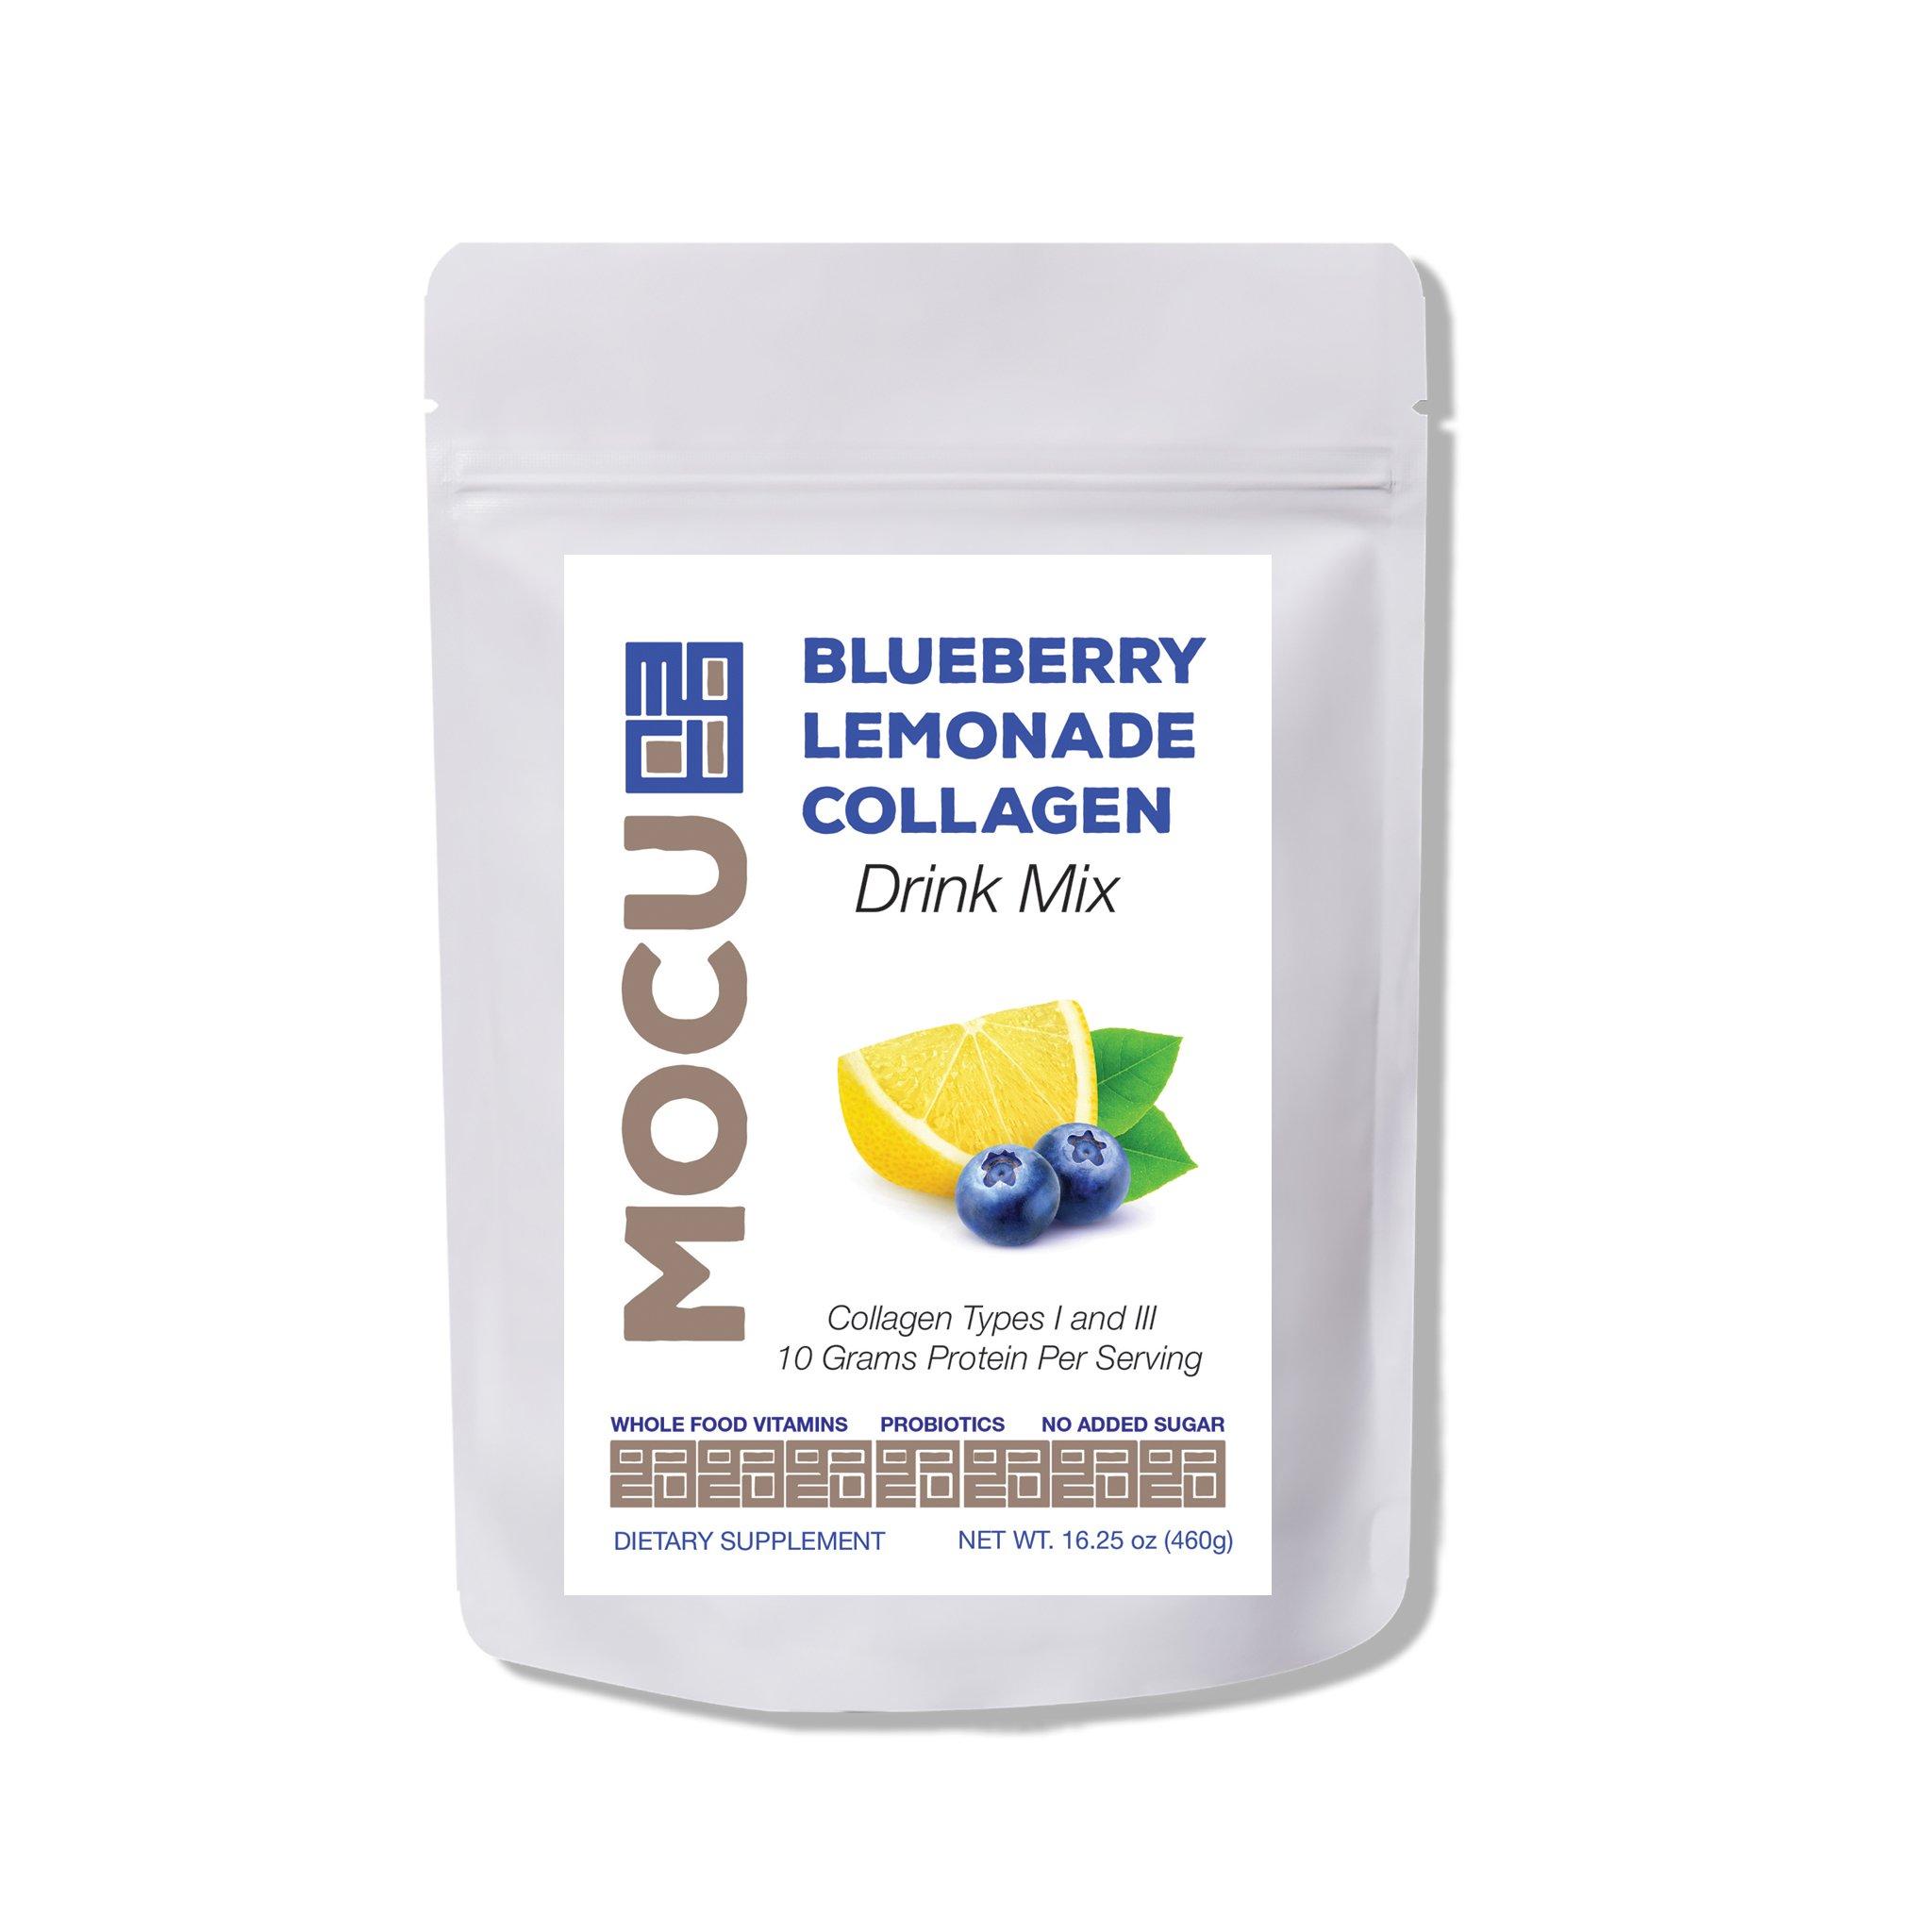 mocu-blueberry-lemonade-collagen-drink-mix-front.jpg